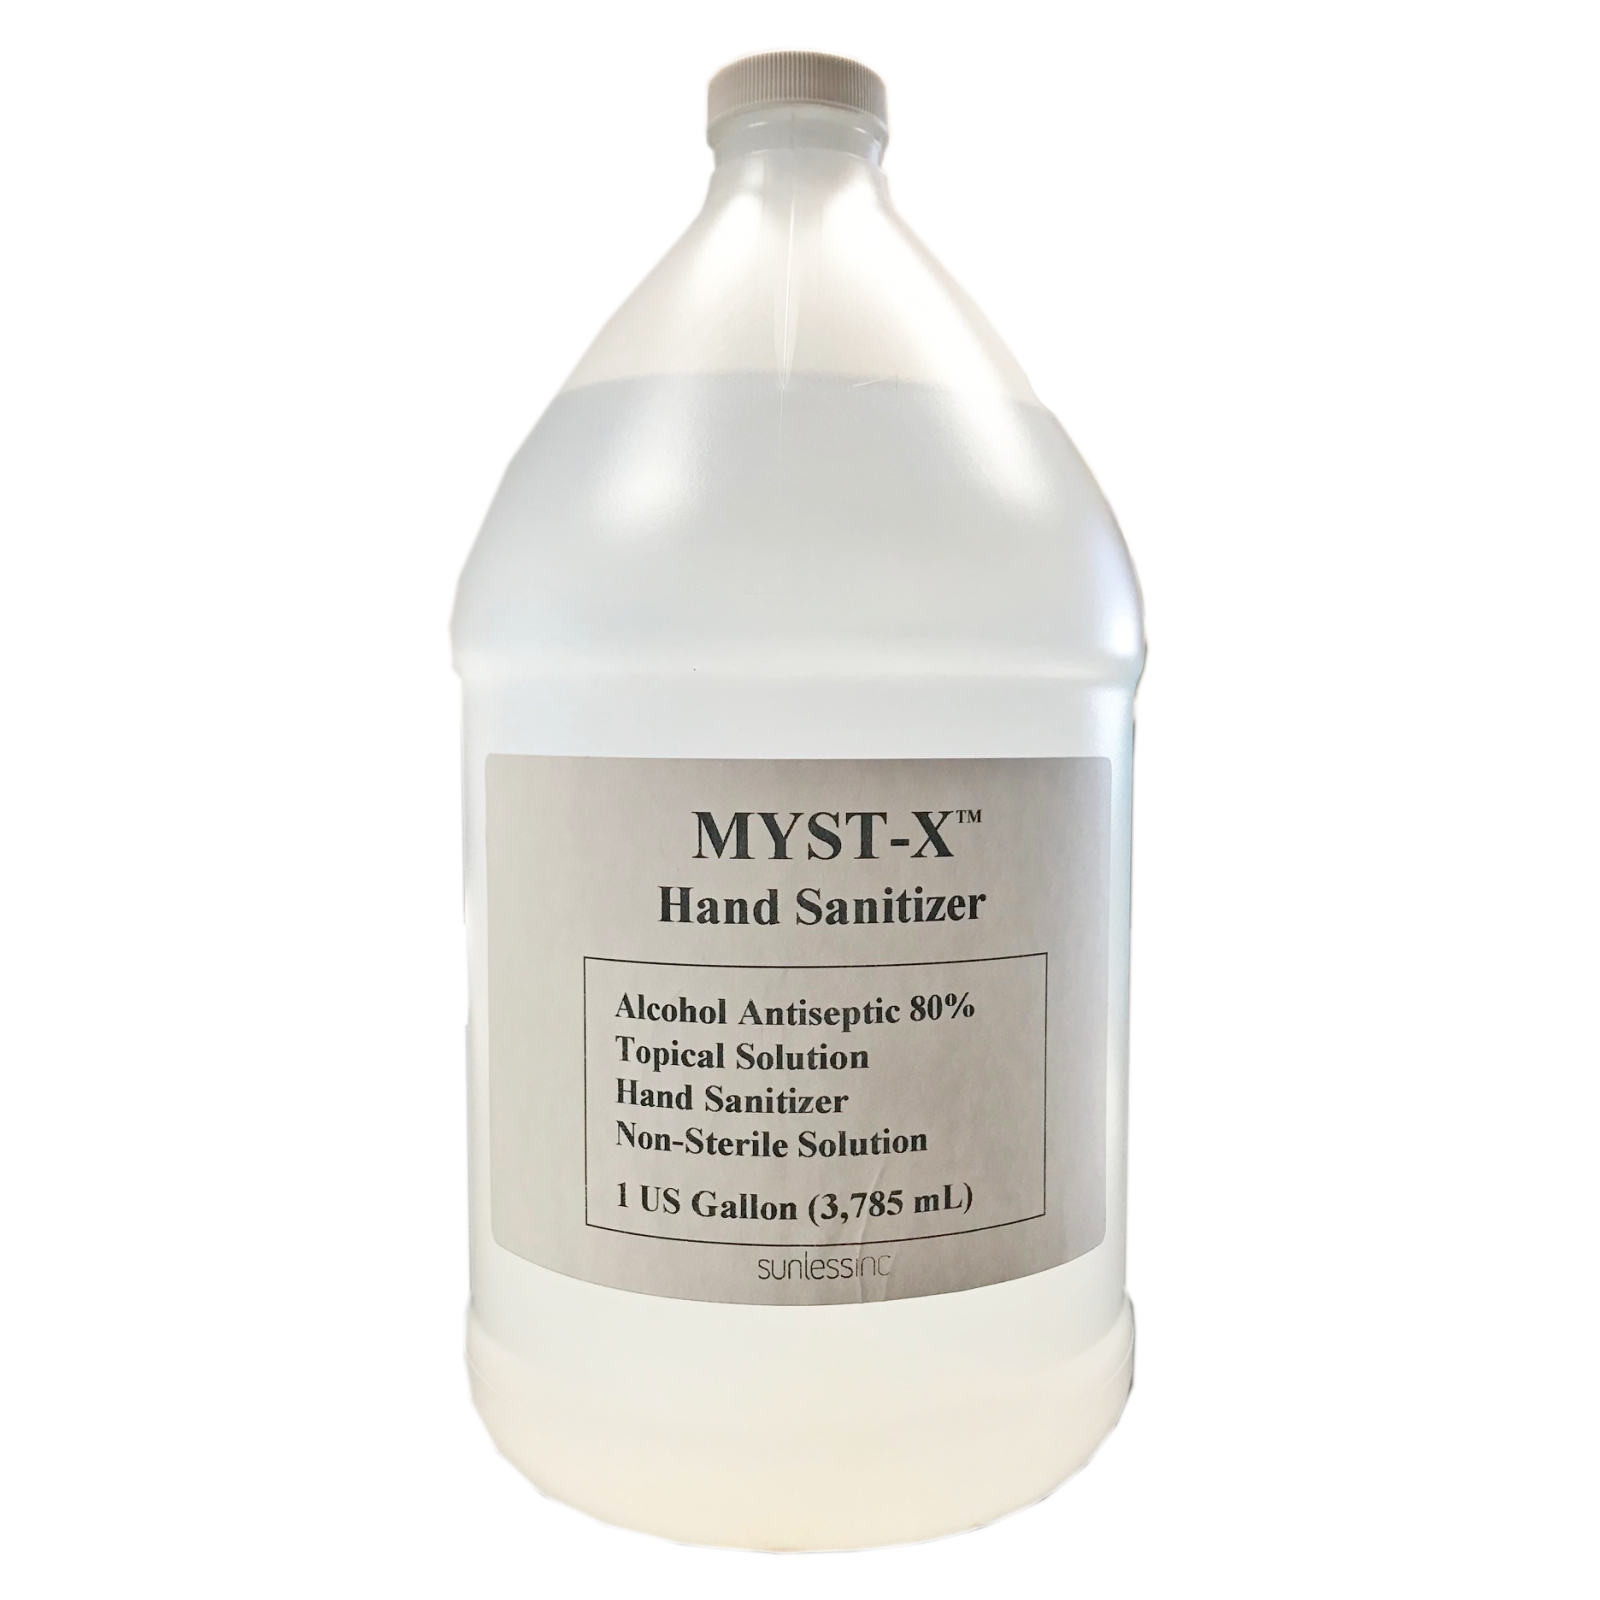 Myst-X Hand Sol 80% Alcohol Gal.